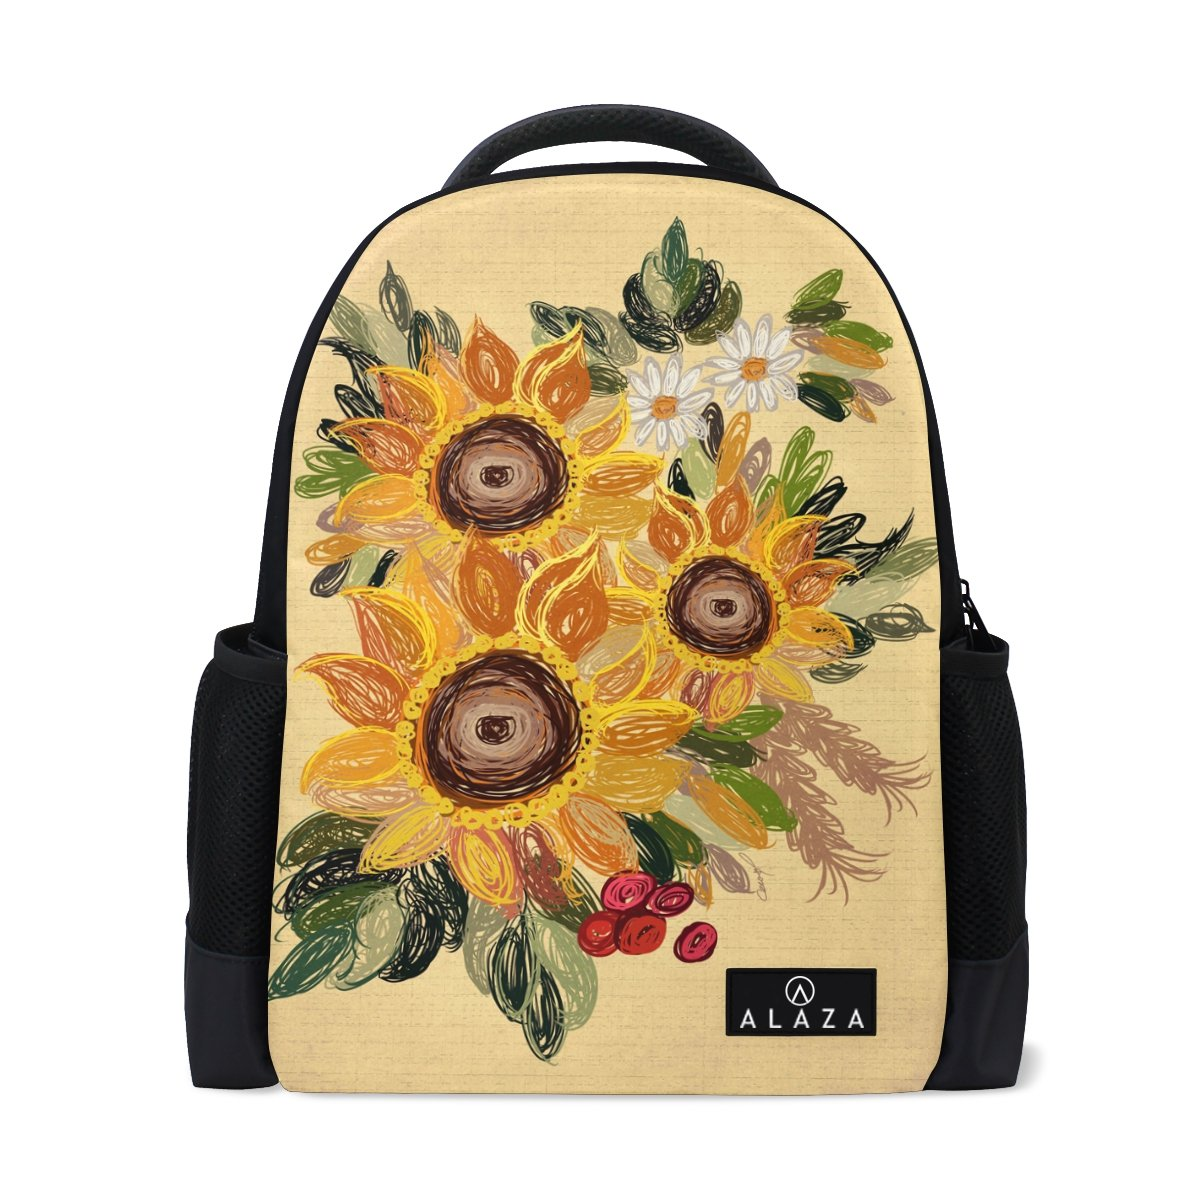 845cc26f2f8e Amazon.com: ZOEO College Backpack Vintage Sunflower Laptop Bookbags ...